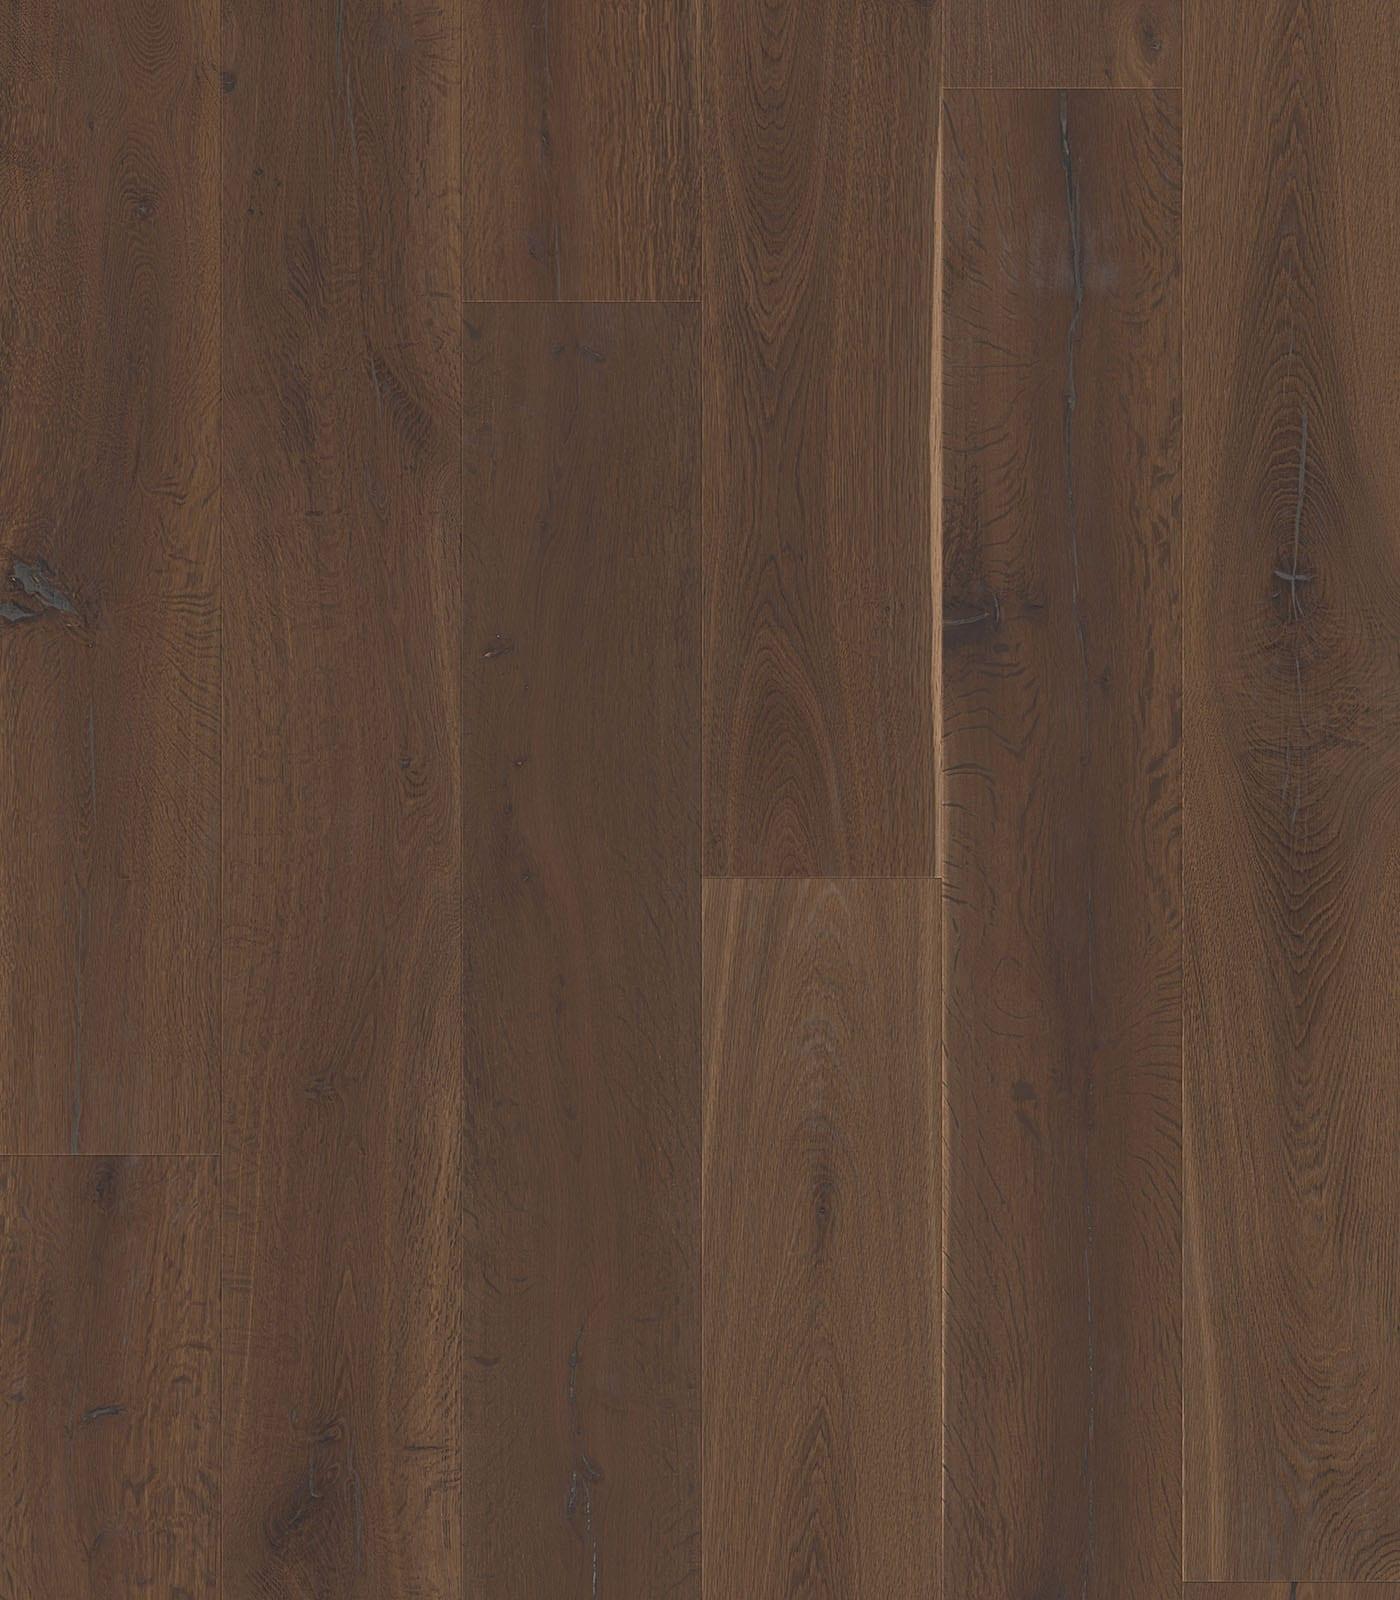 Zagros-Antique collection-European Oak Floors